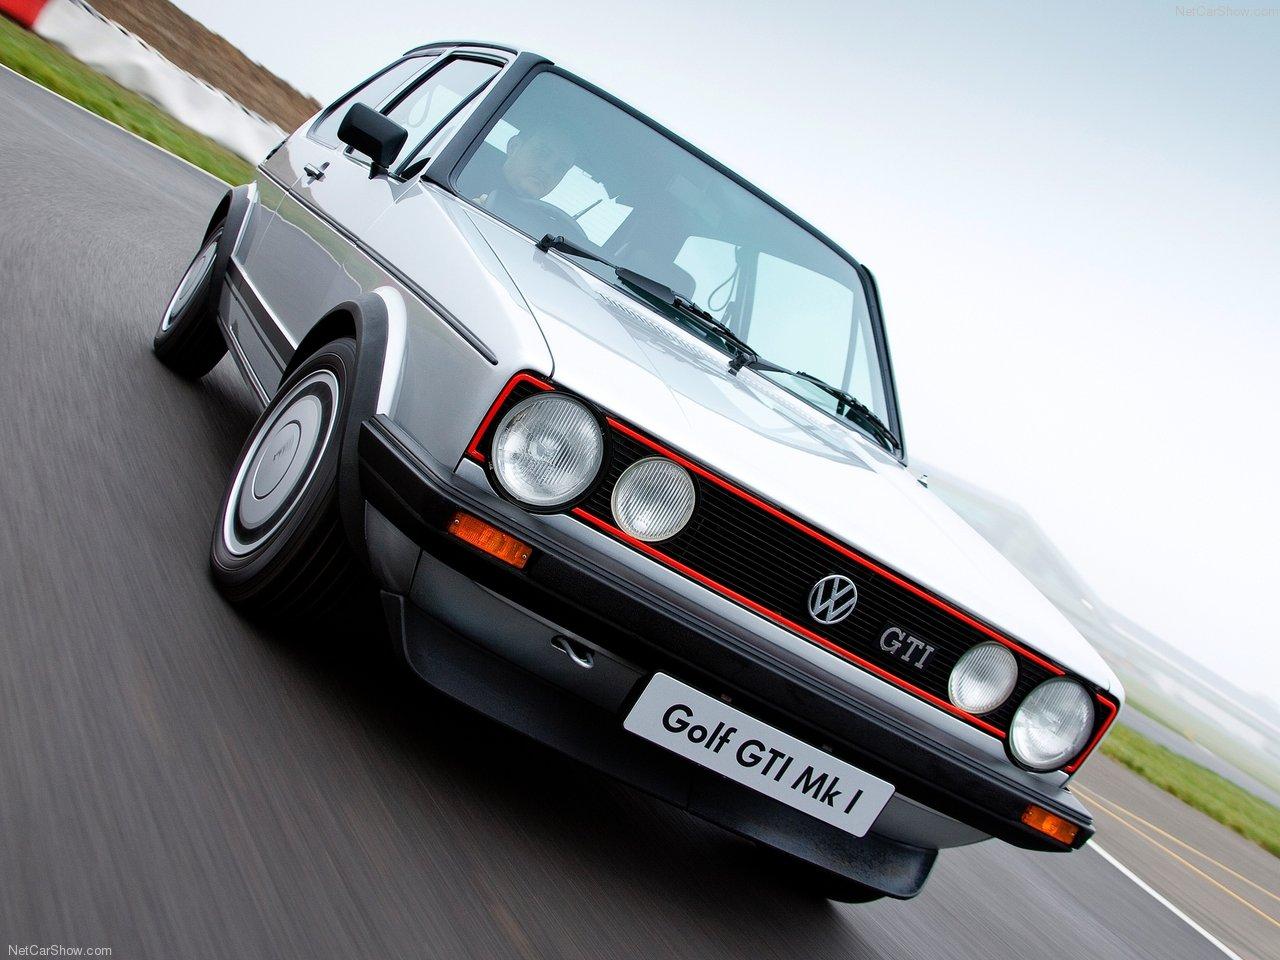 Ikonet VW Golf Mk1 GTI